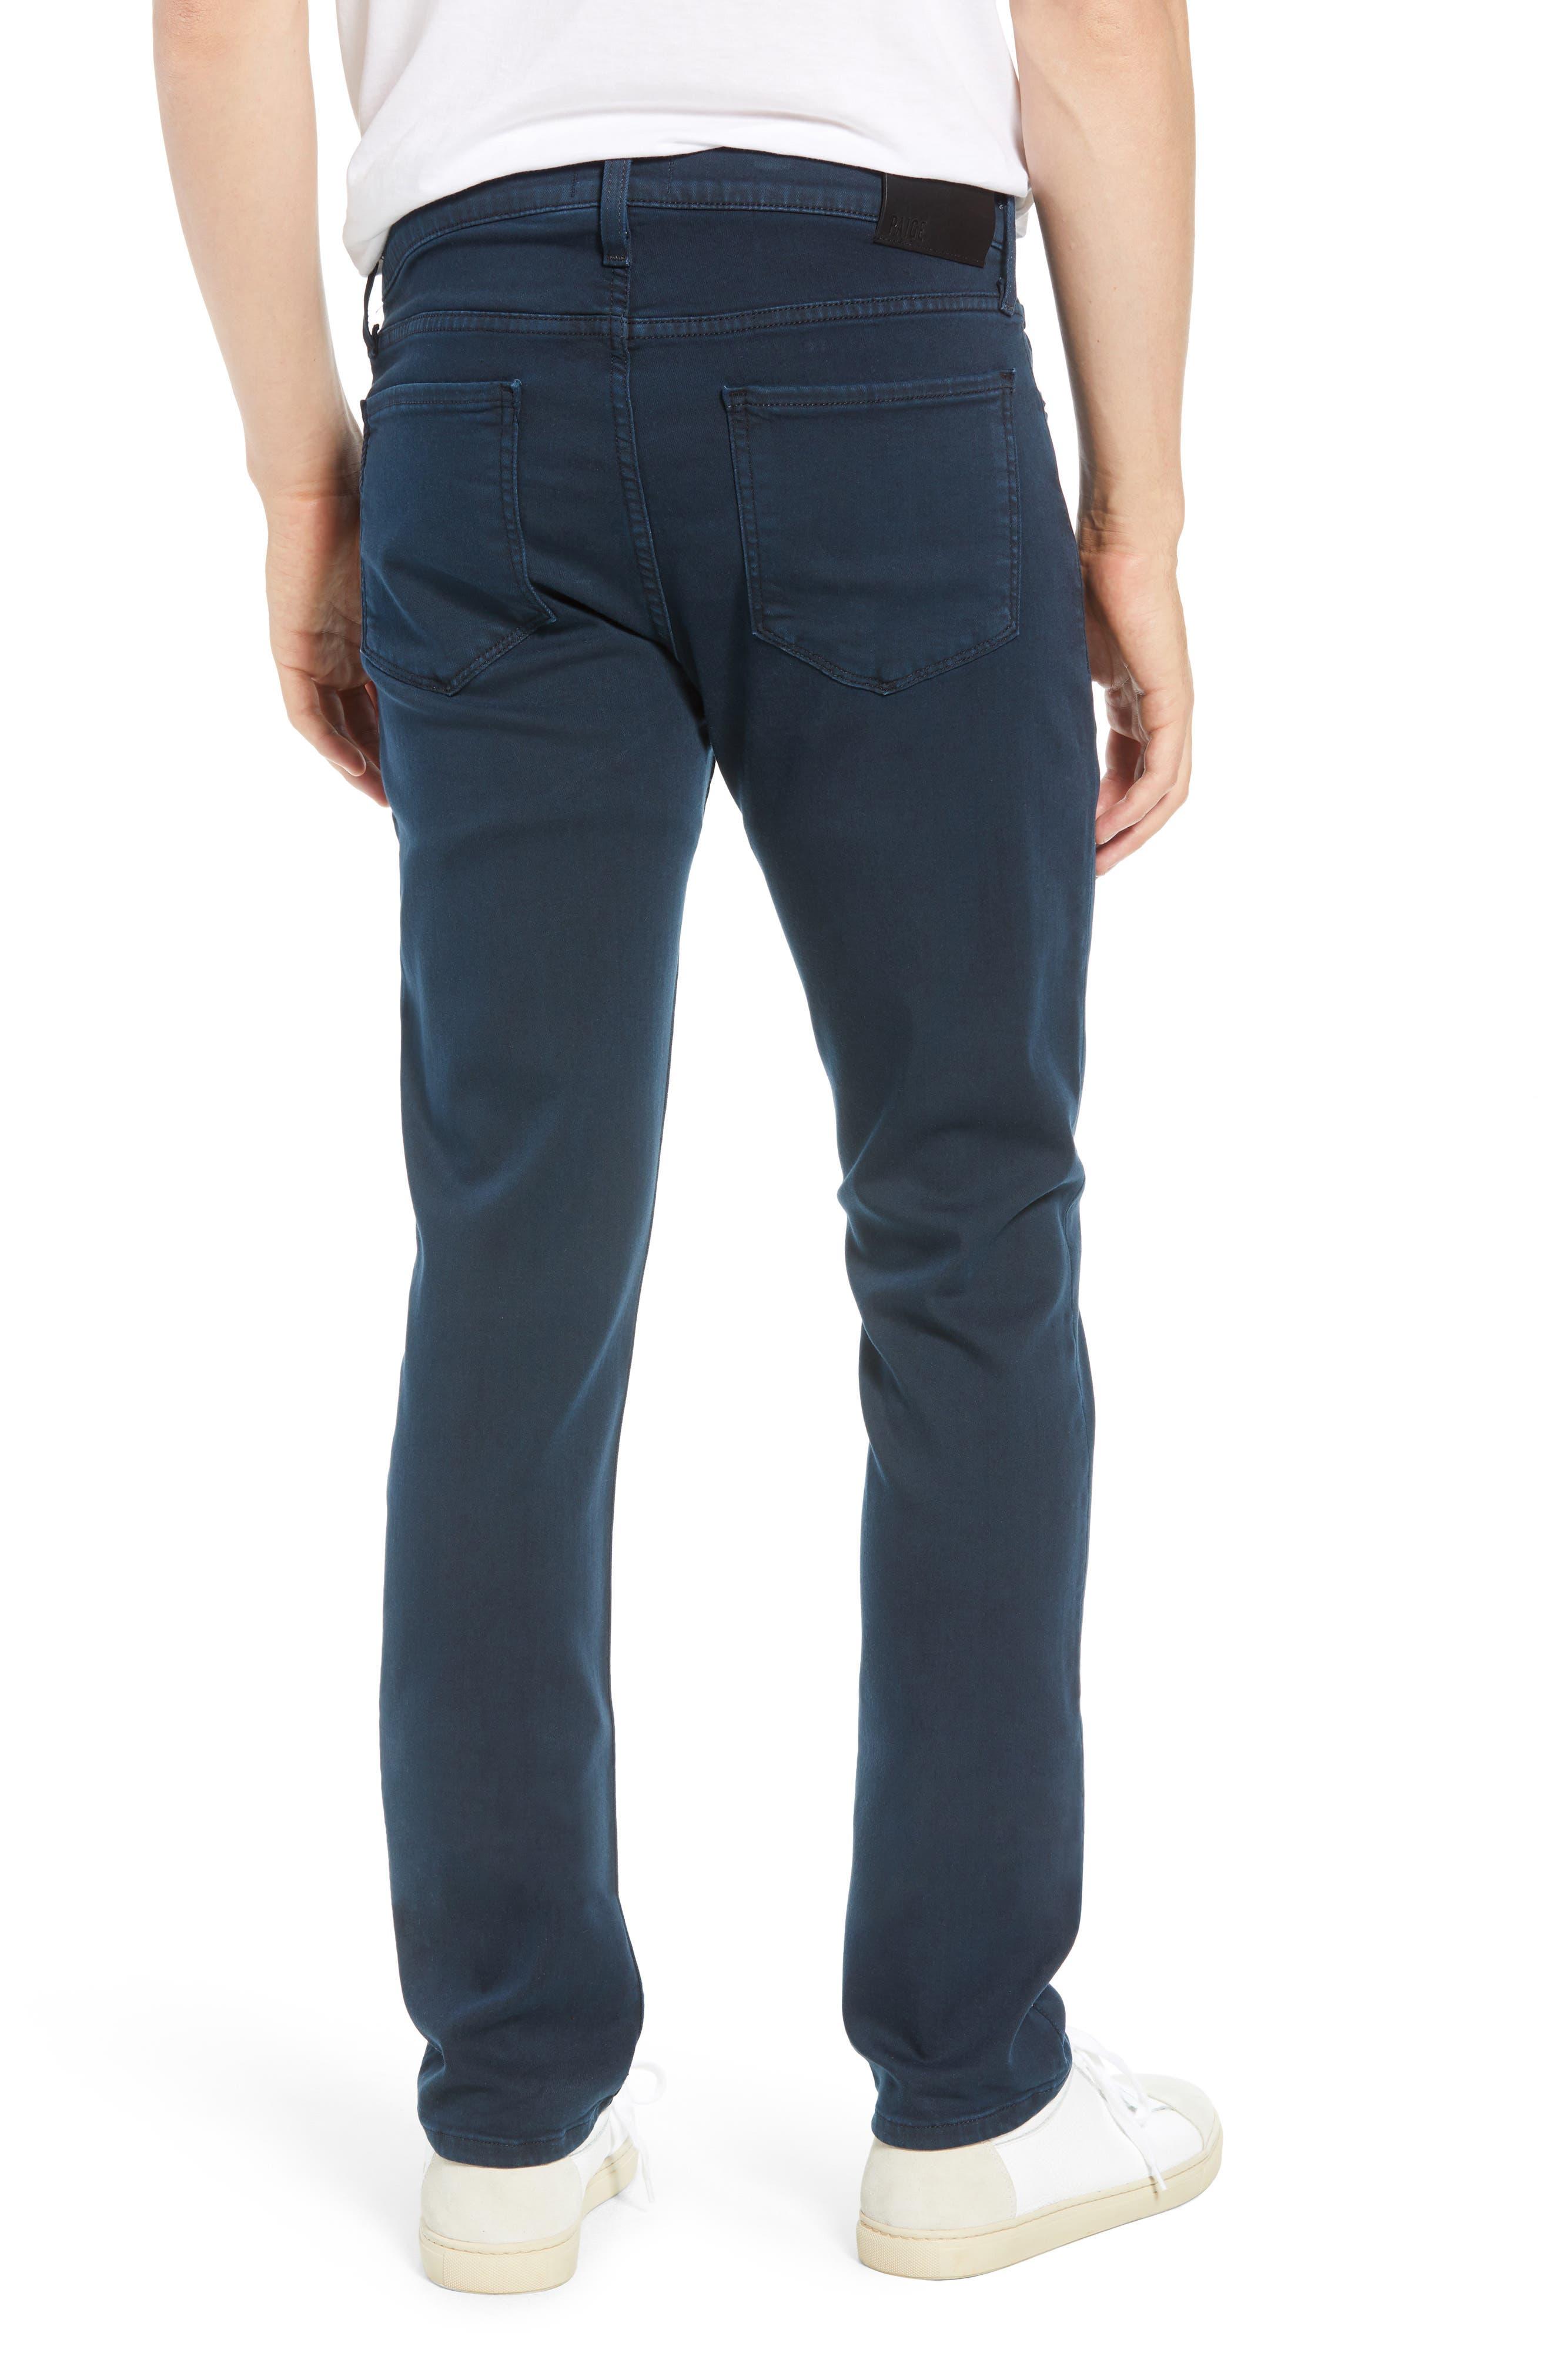 Transcend - Lennox Slim Jeans,                             Alternate thumbnail 2, color,                             401